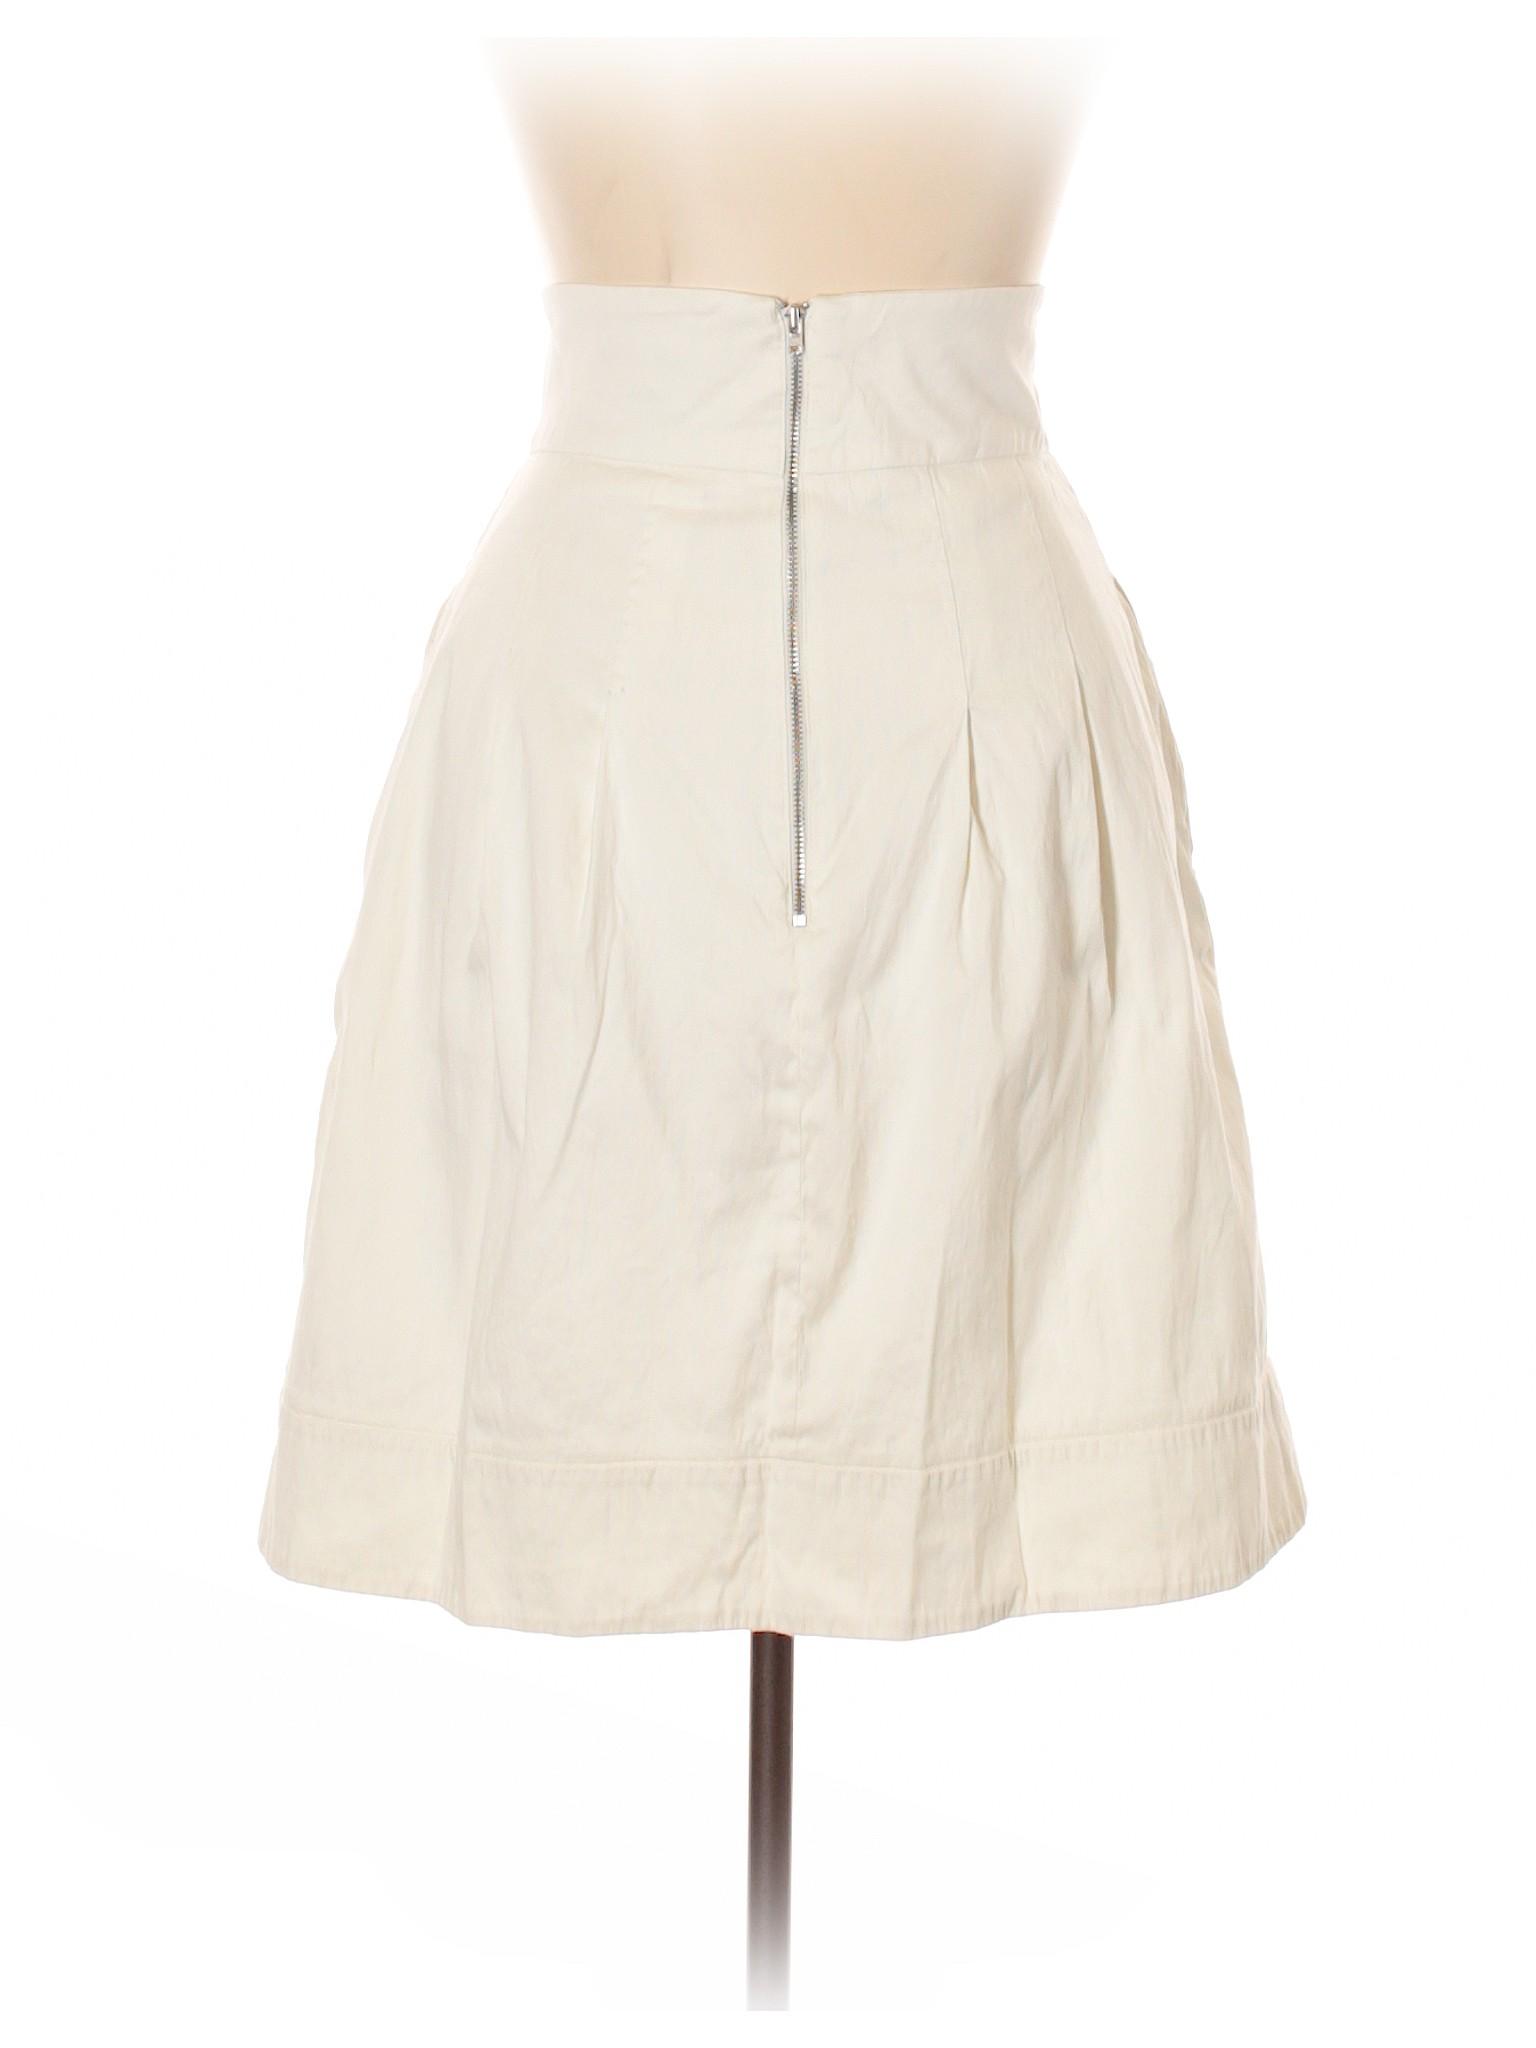 Boutique Boutique Boutique Skirt Casual Skirt Casual Skirt Casual Boutique Casual wH1ScqIC